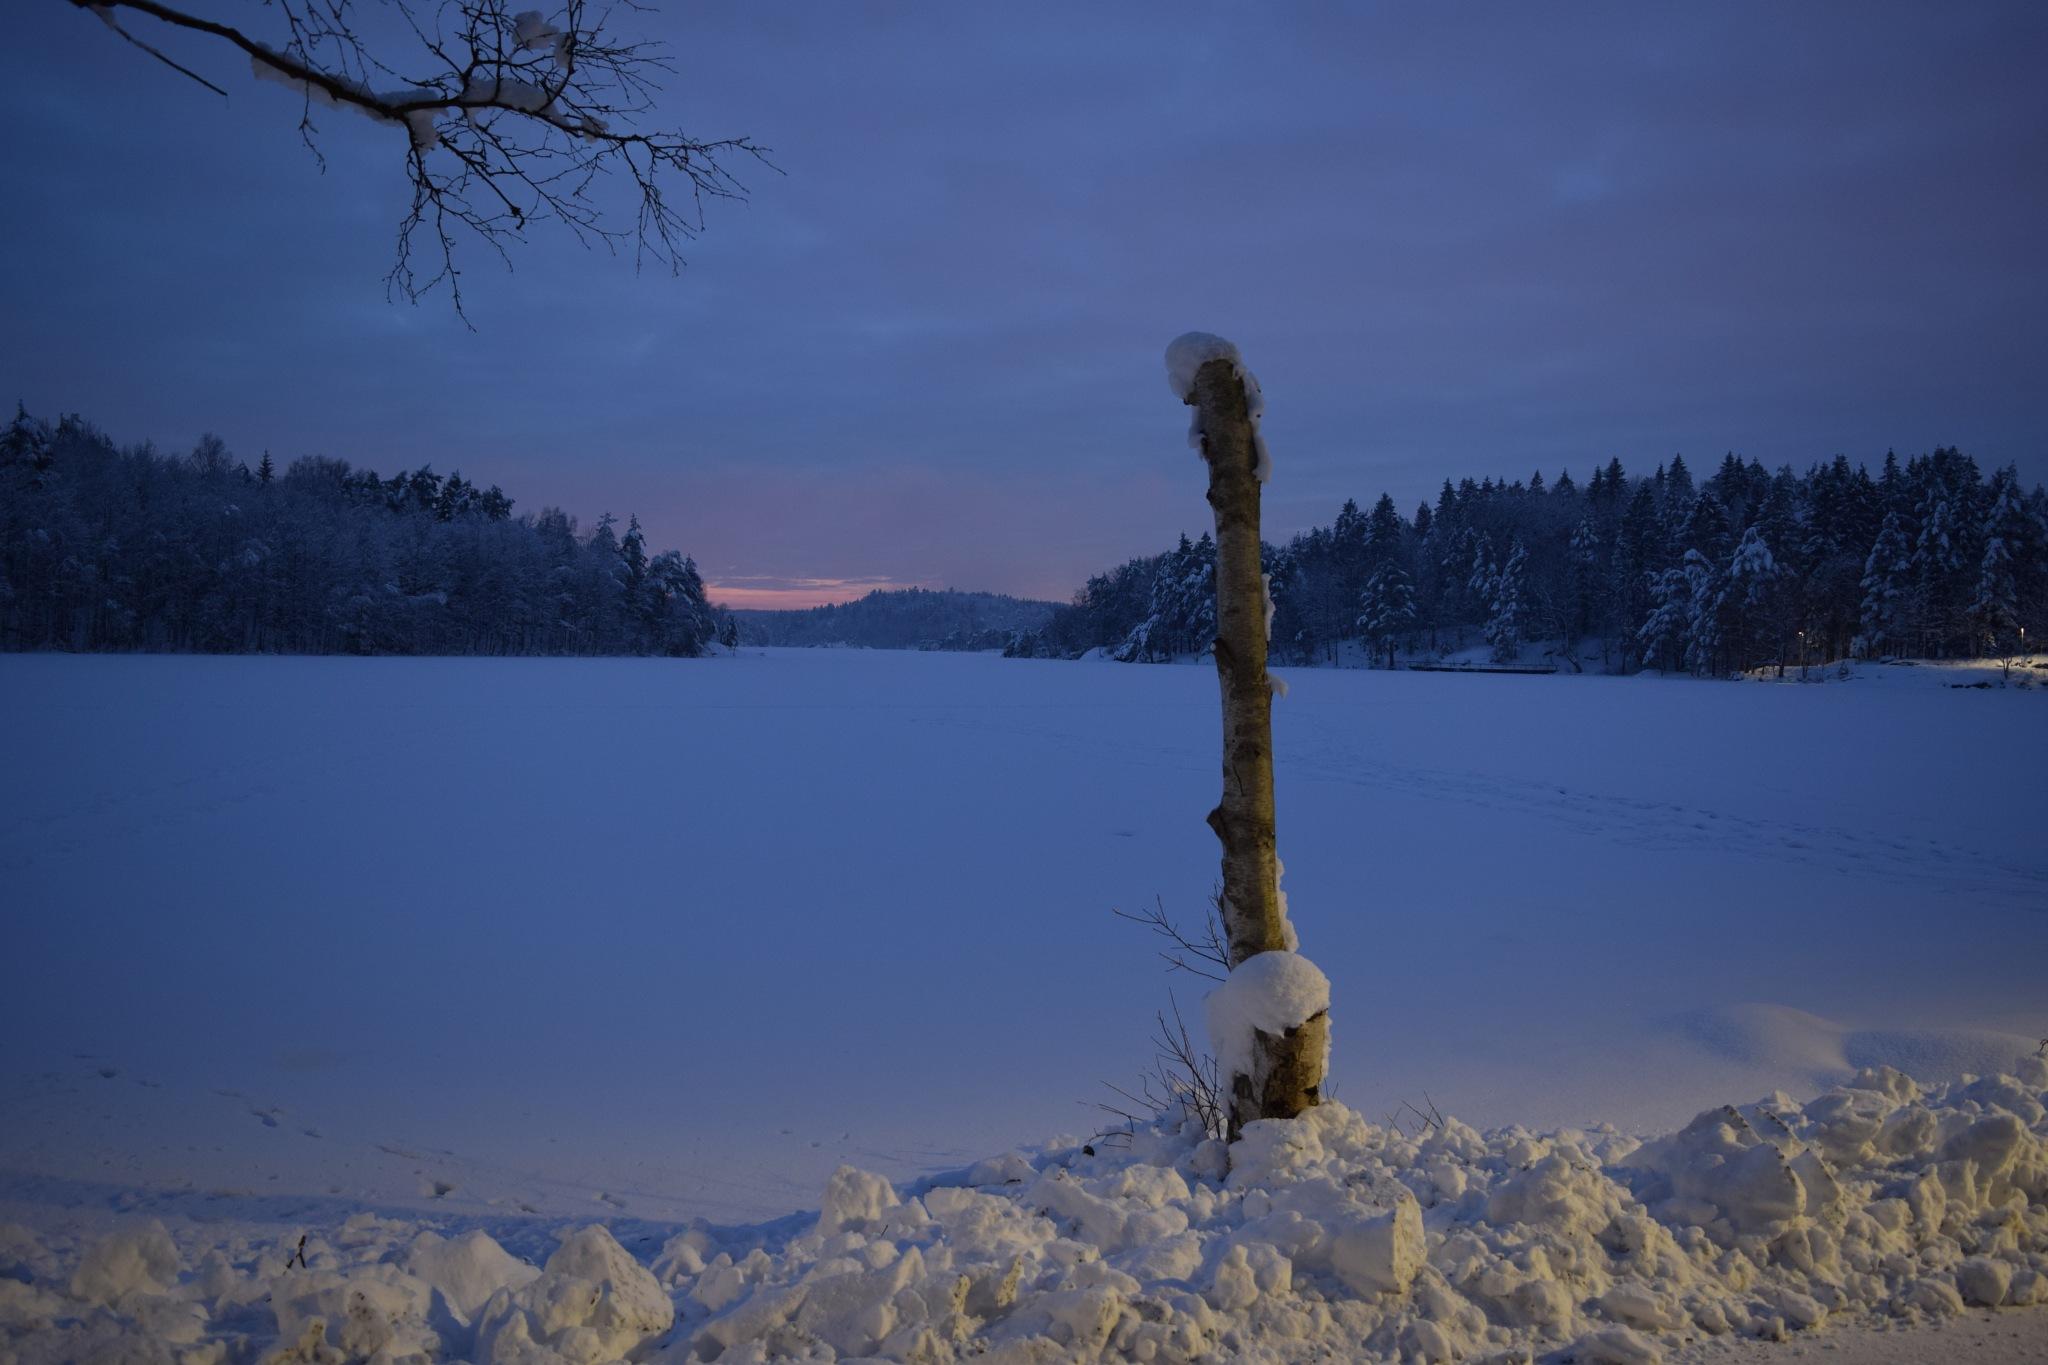 Delsjön by Svennex